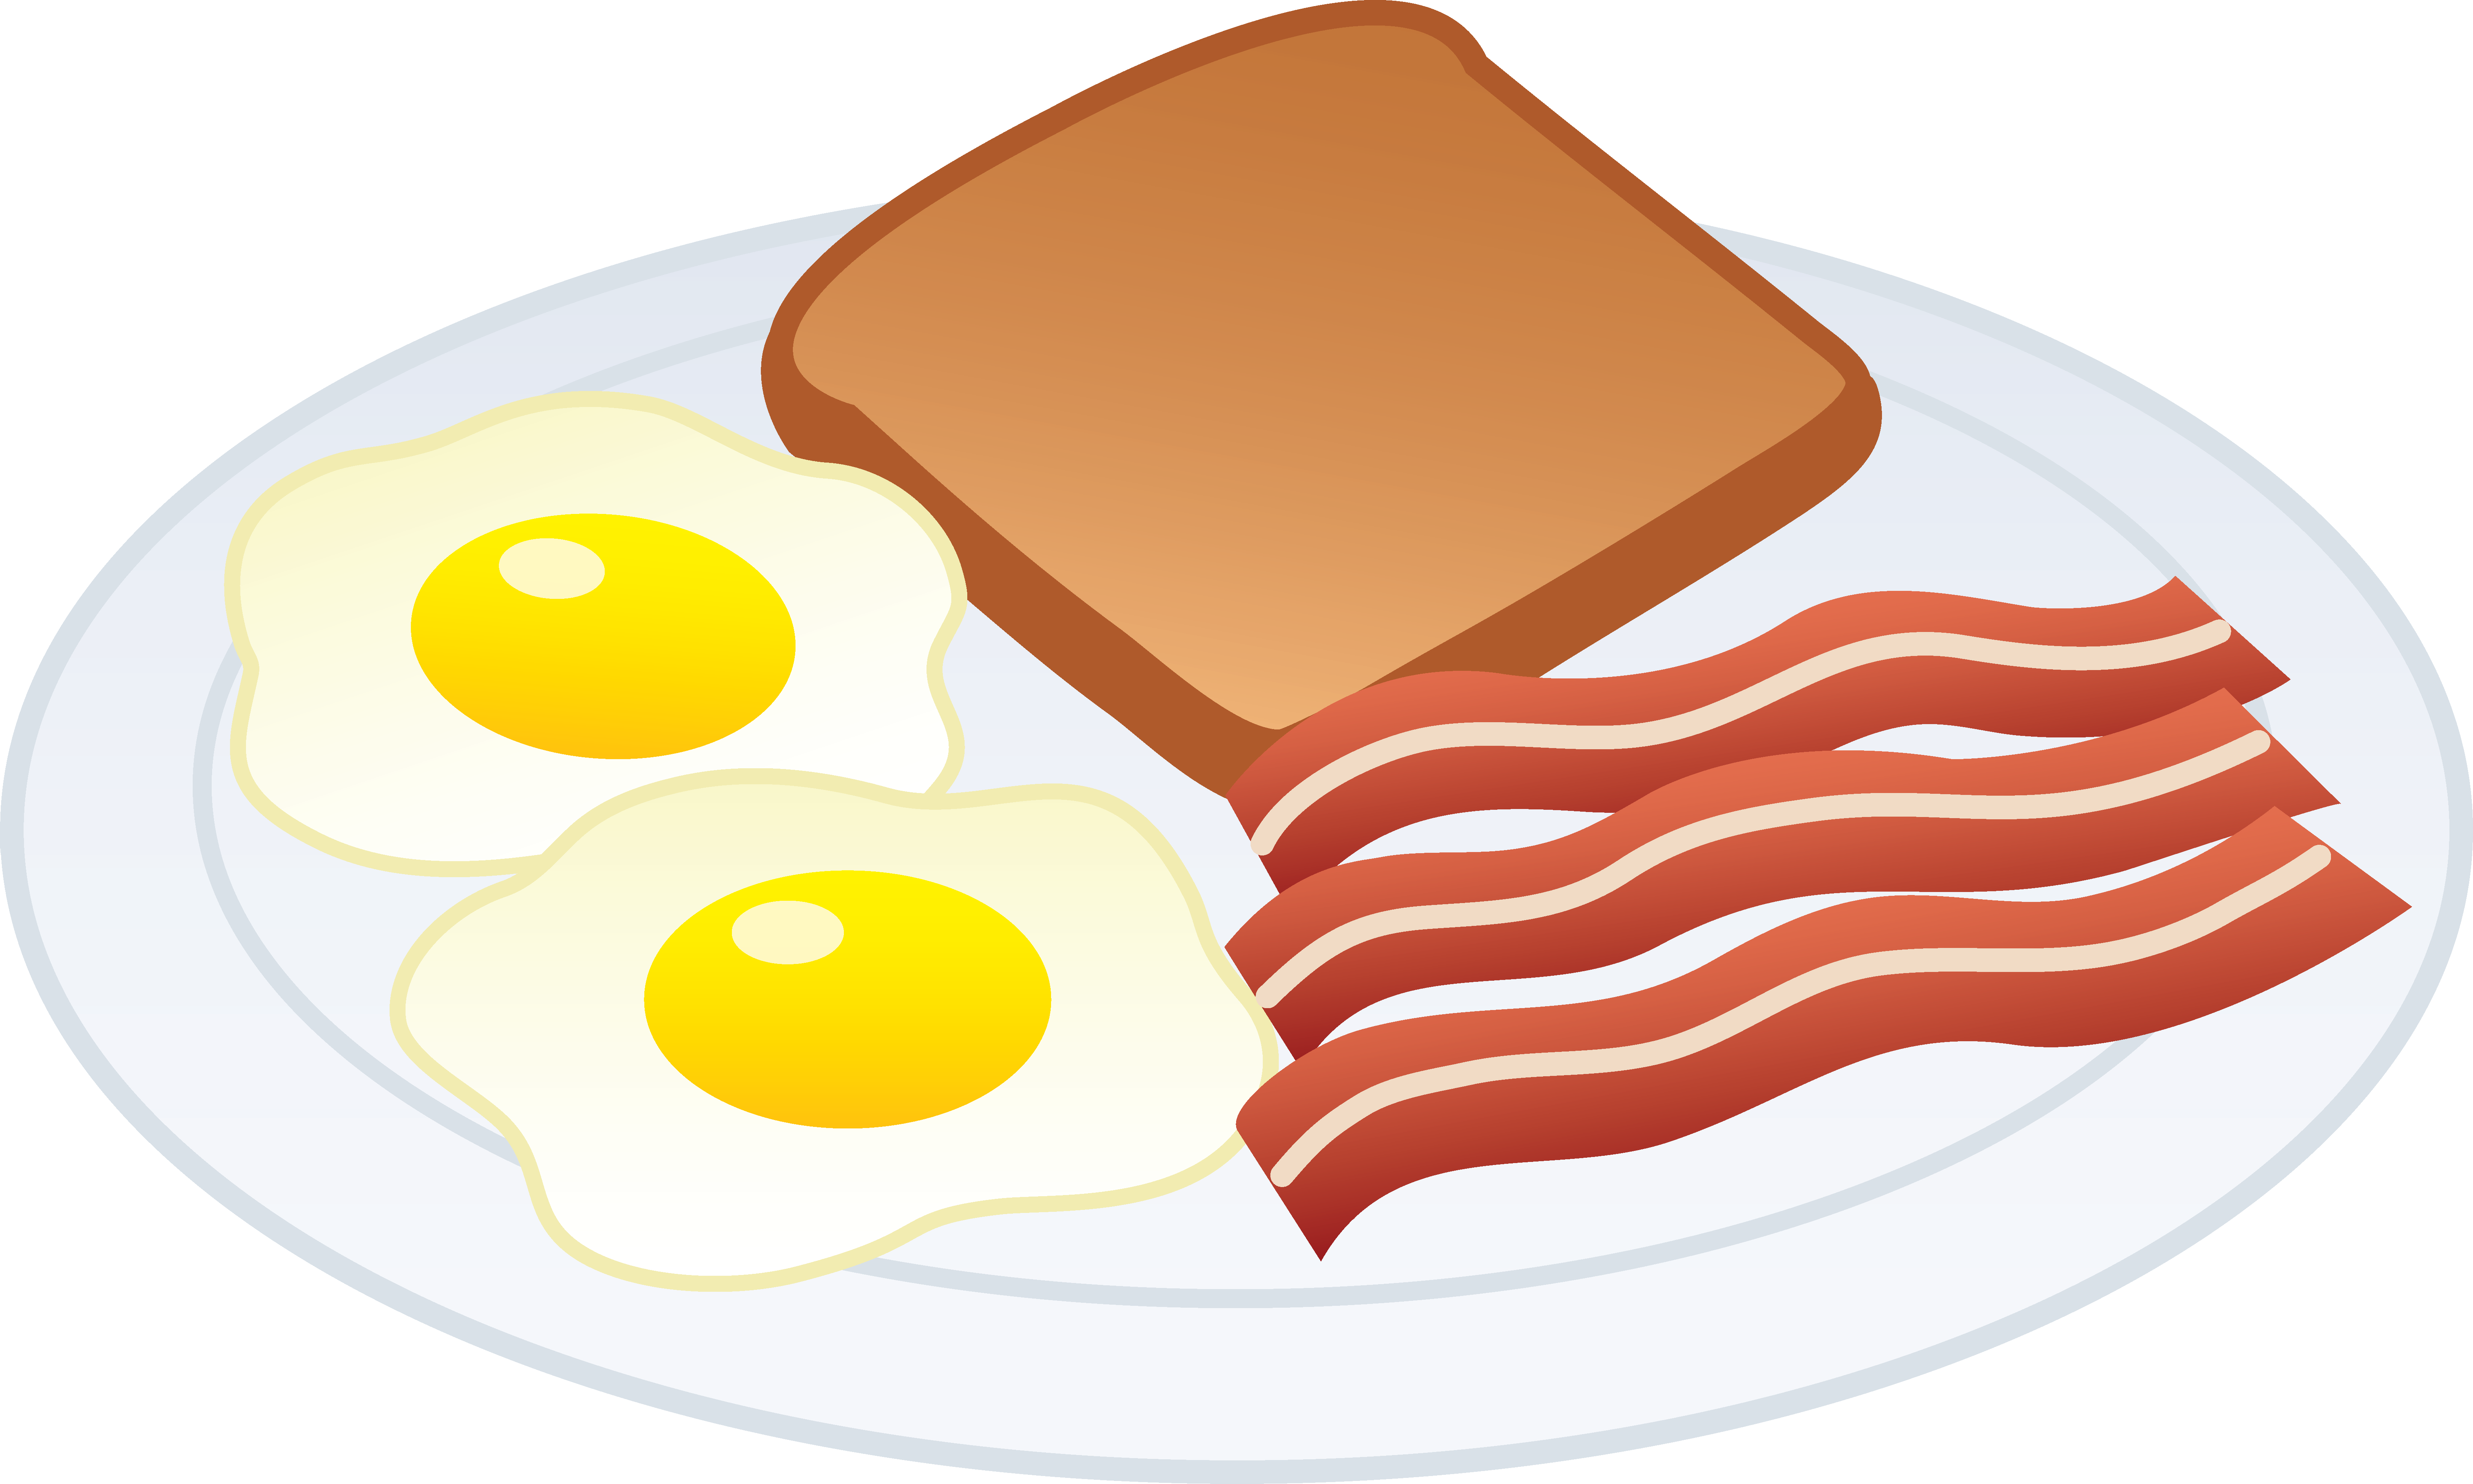 6494x3898 Download Breakfast Clip Art Free Clipart Of Breakfast Food 3